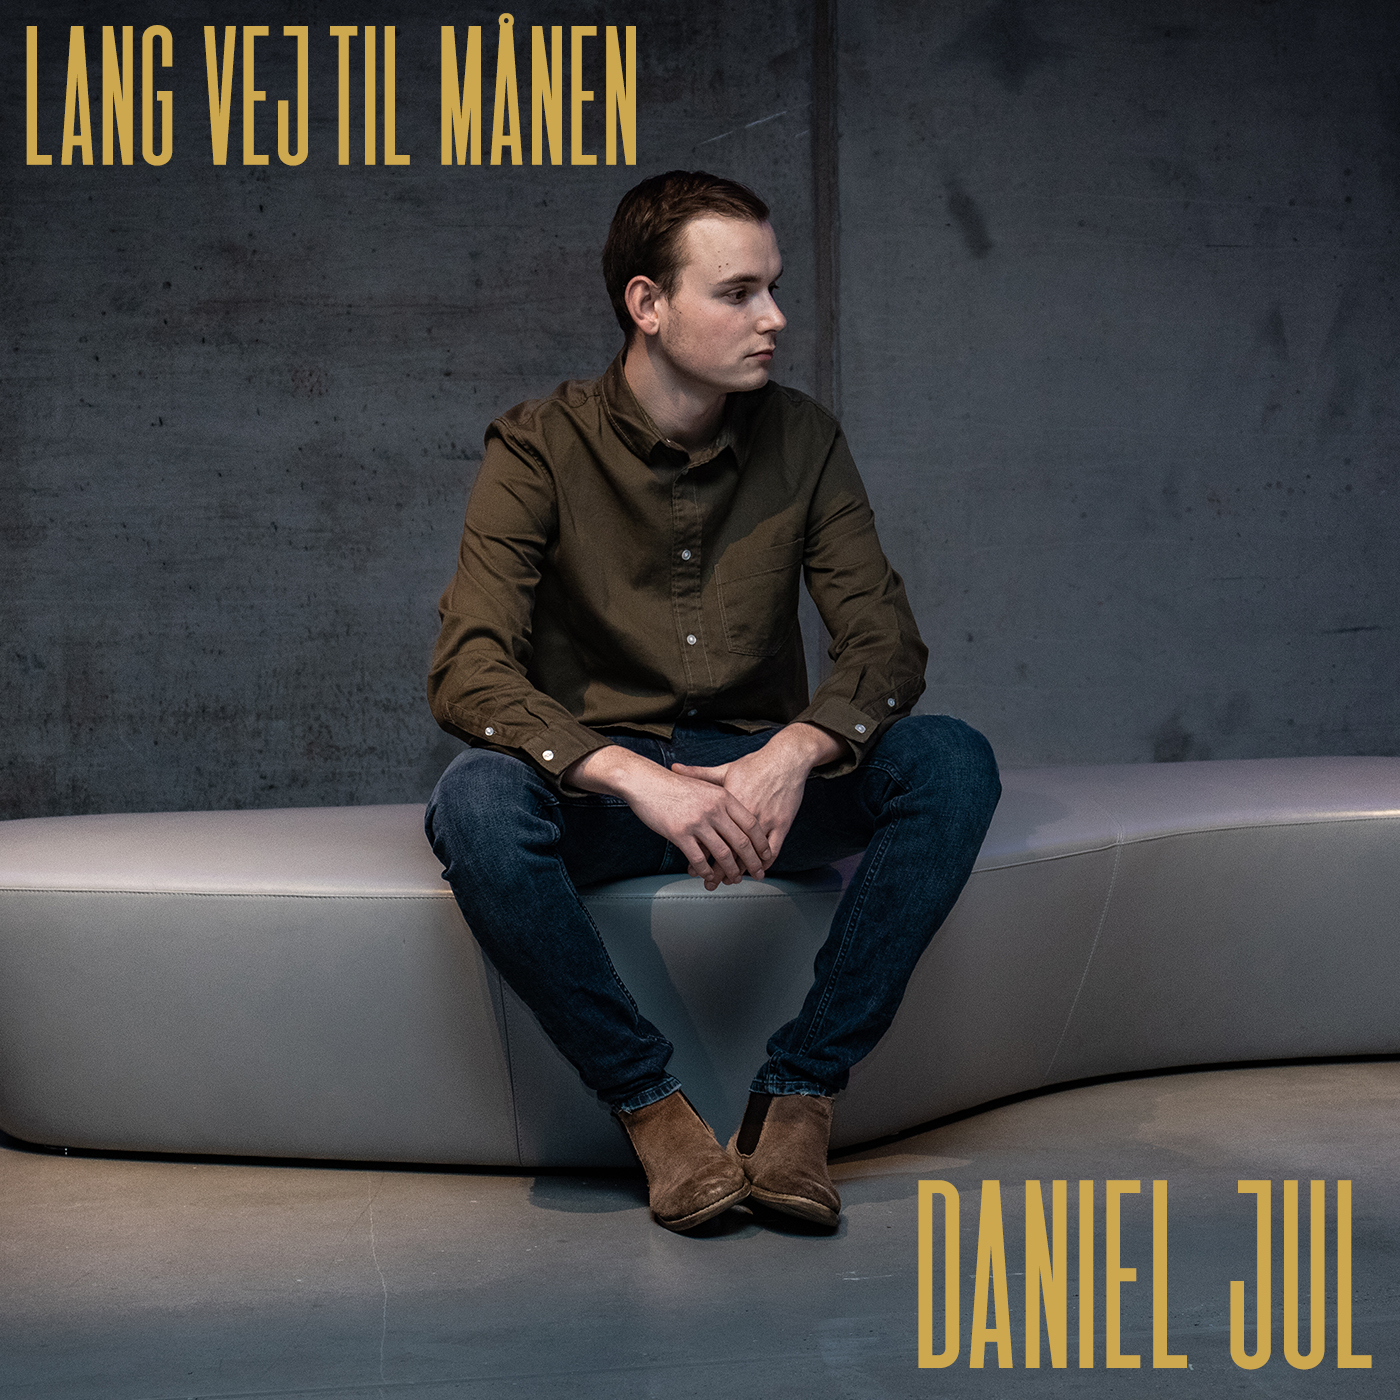 Daniel Jul – Lang Vej Til Månen (single)